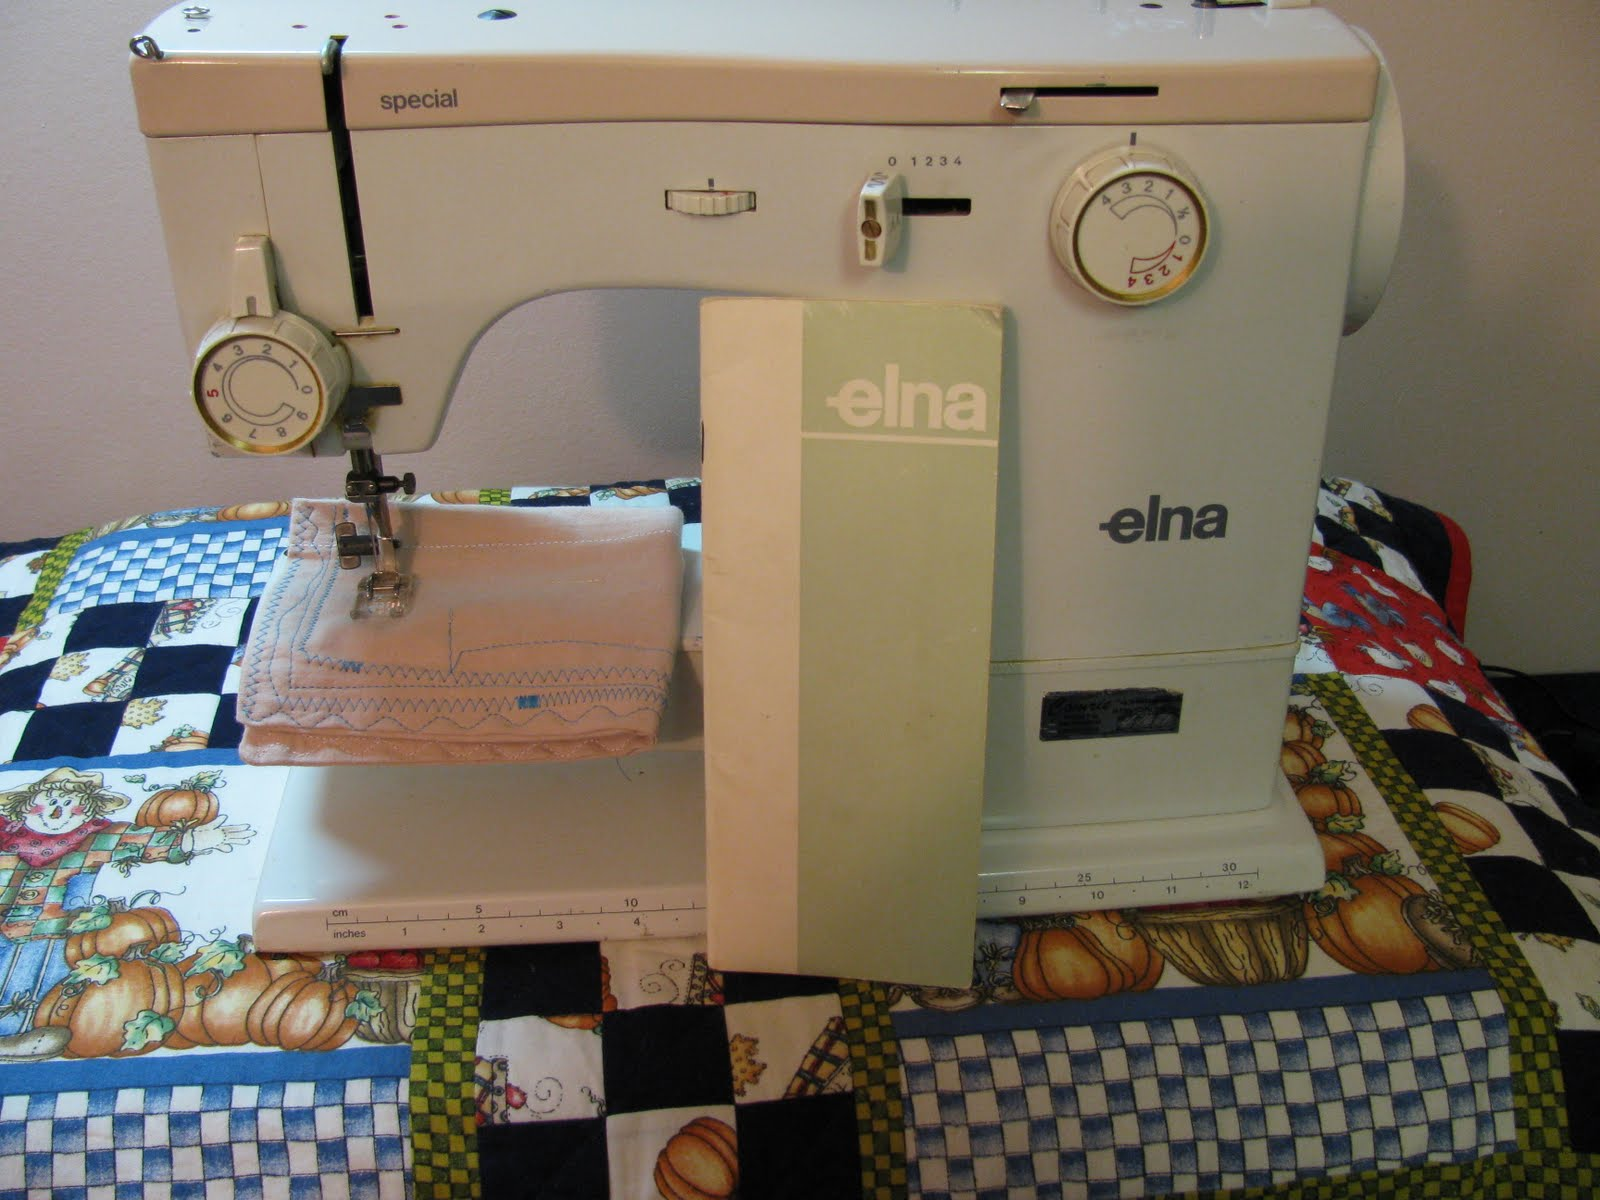 Elna Sewing Machine Parts Diagram Ford Focus Wiring 2001 Tammy 39s Craft Emporium Special Manual